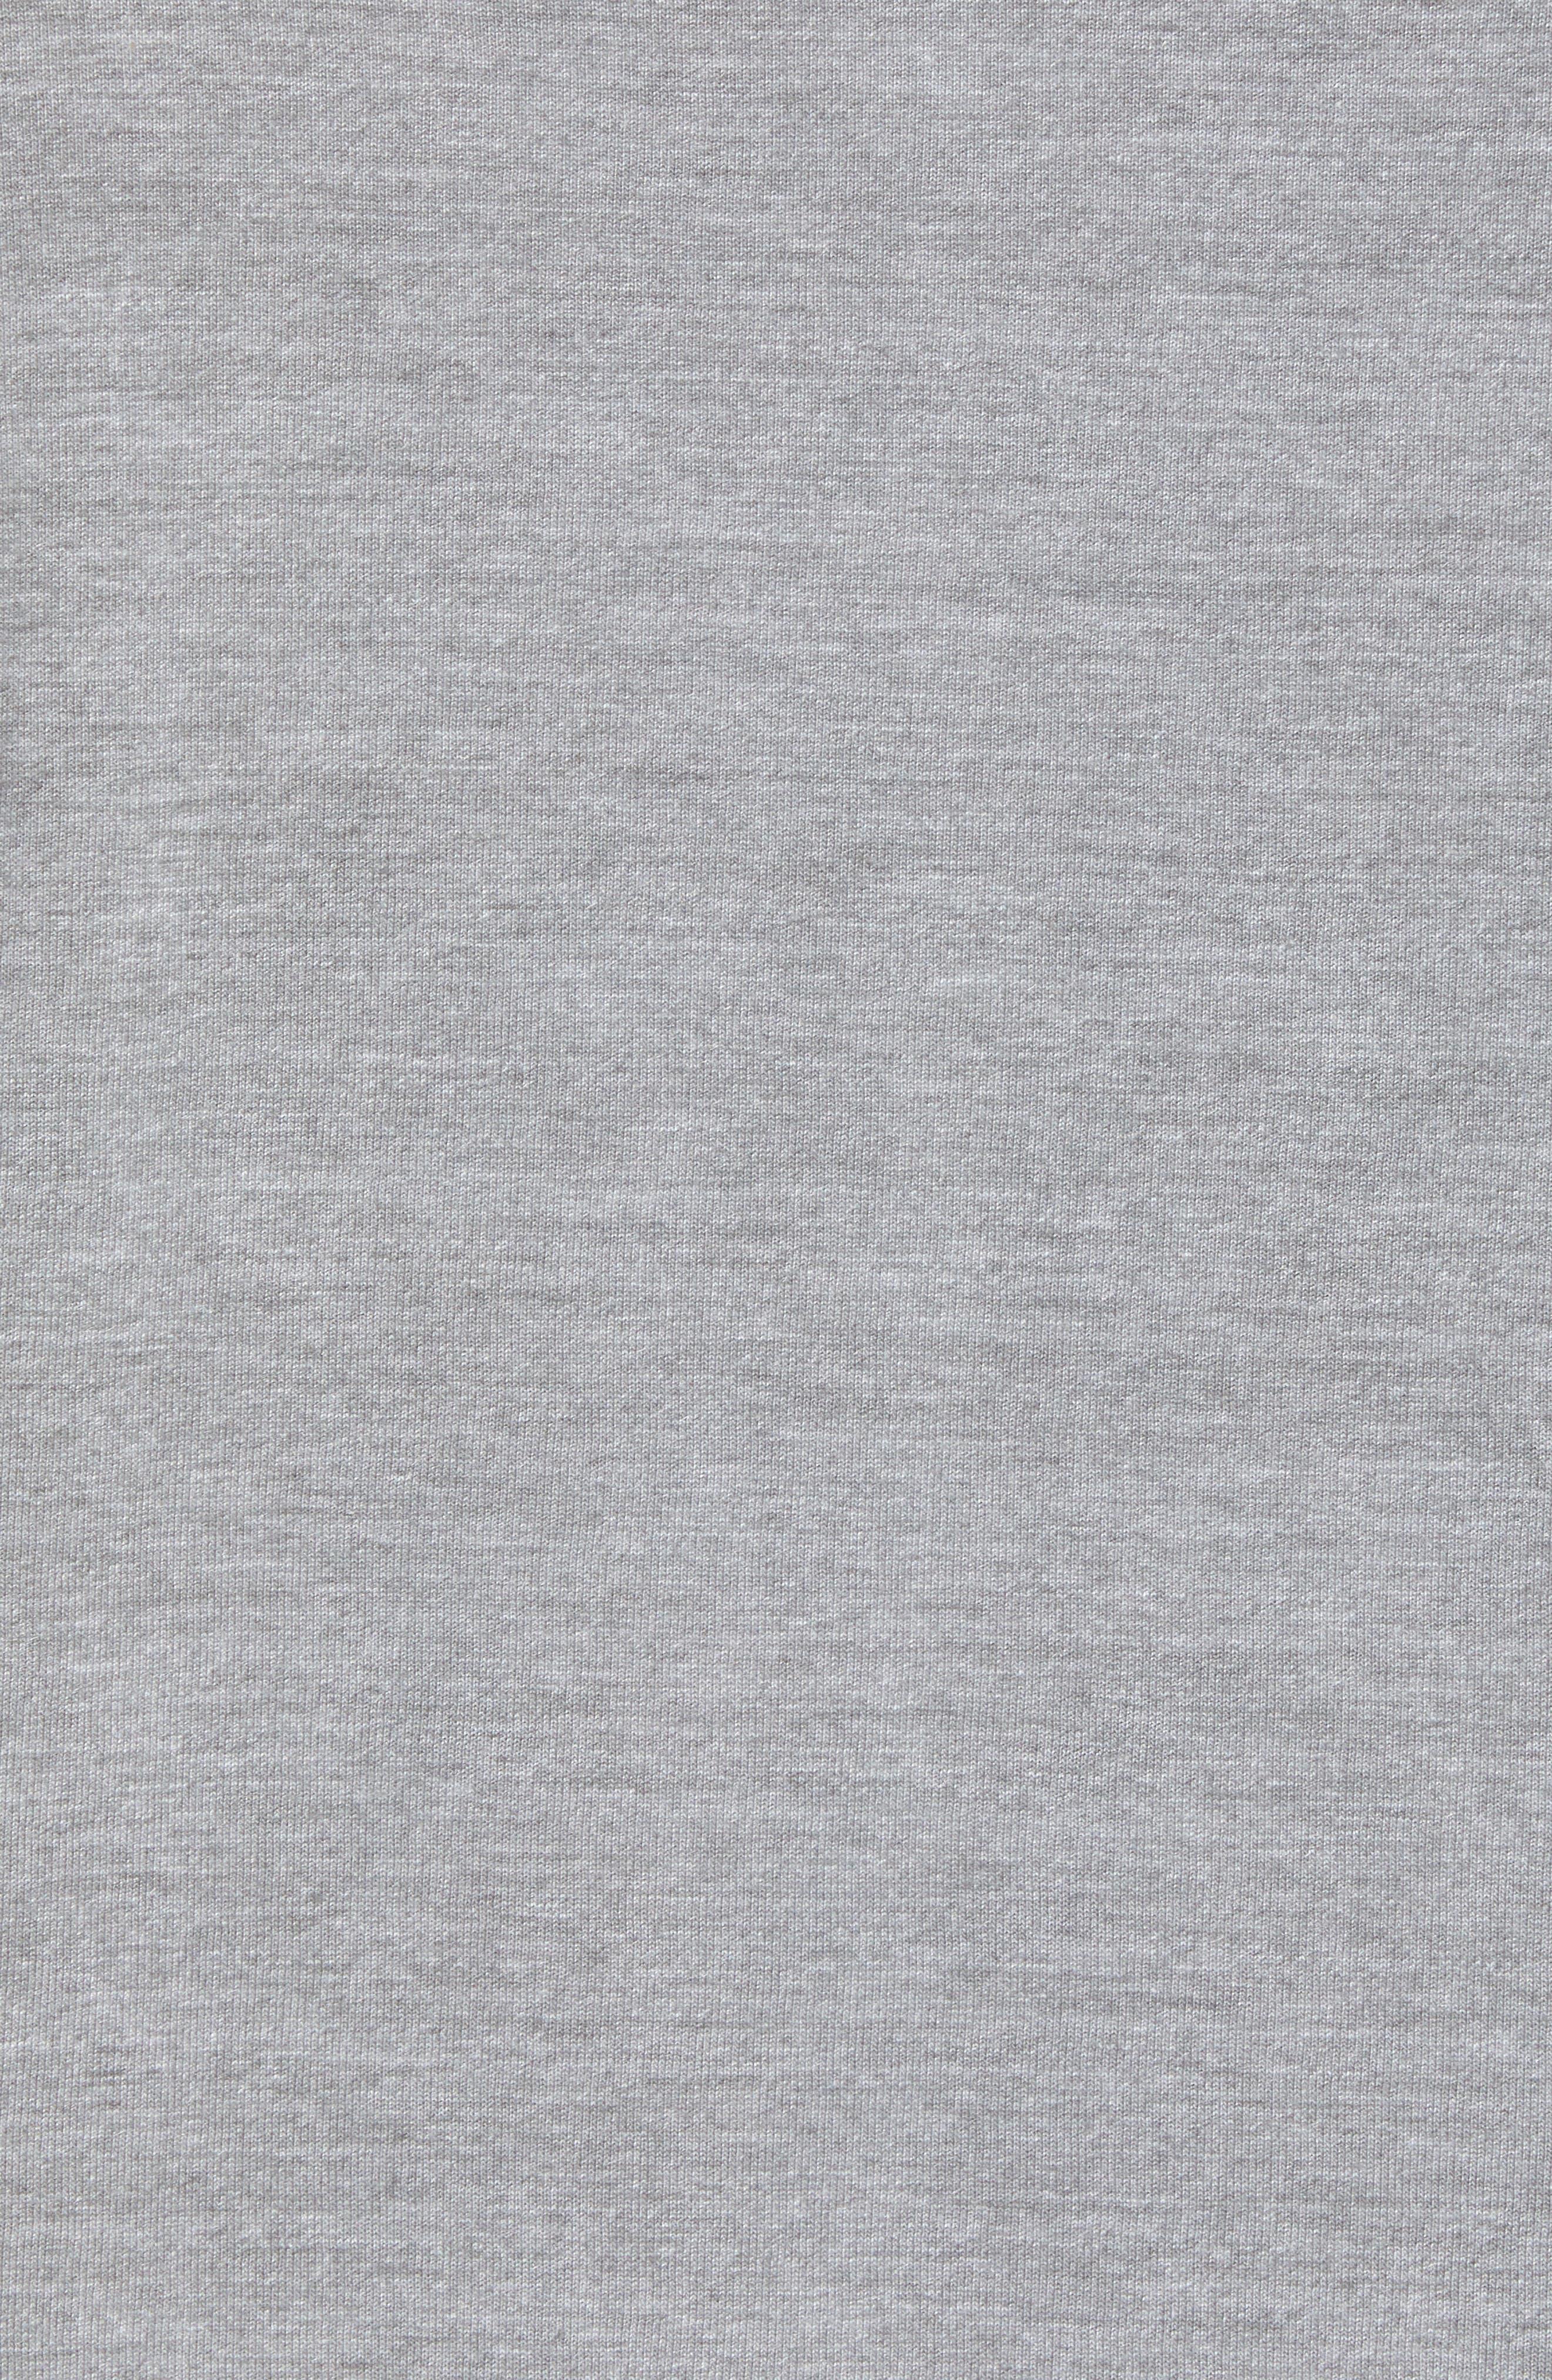 Americana Crewneck T-Shirt,                             Alternate thumbnail 5, color,                             Tnf Medium Grey Heather